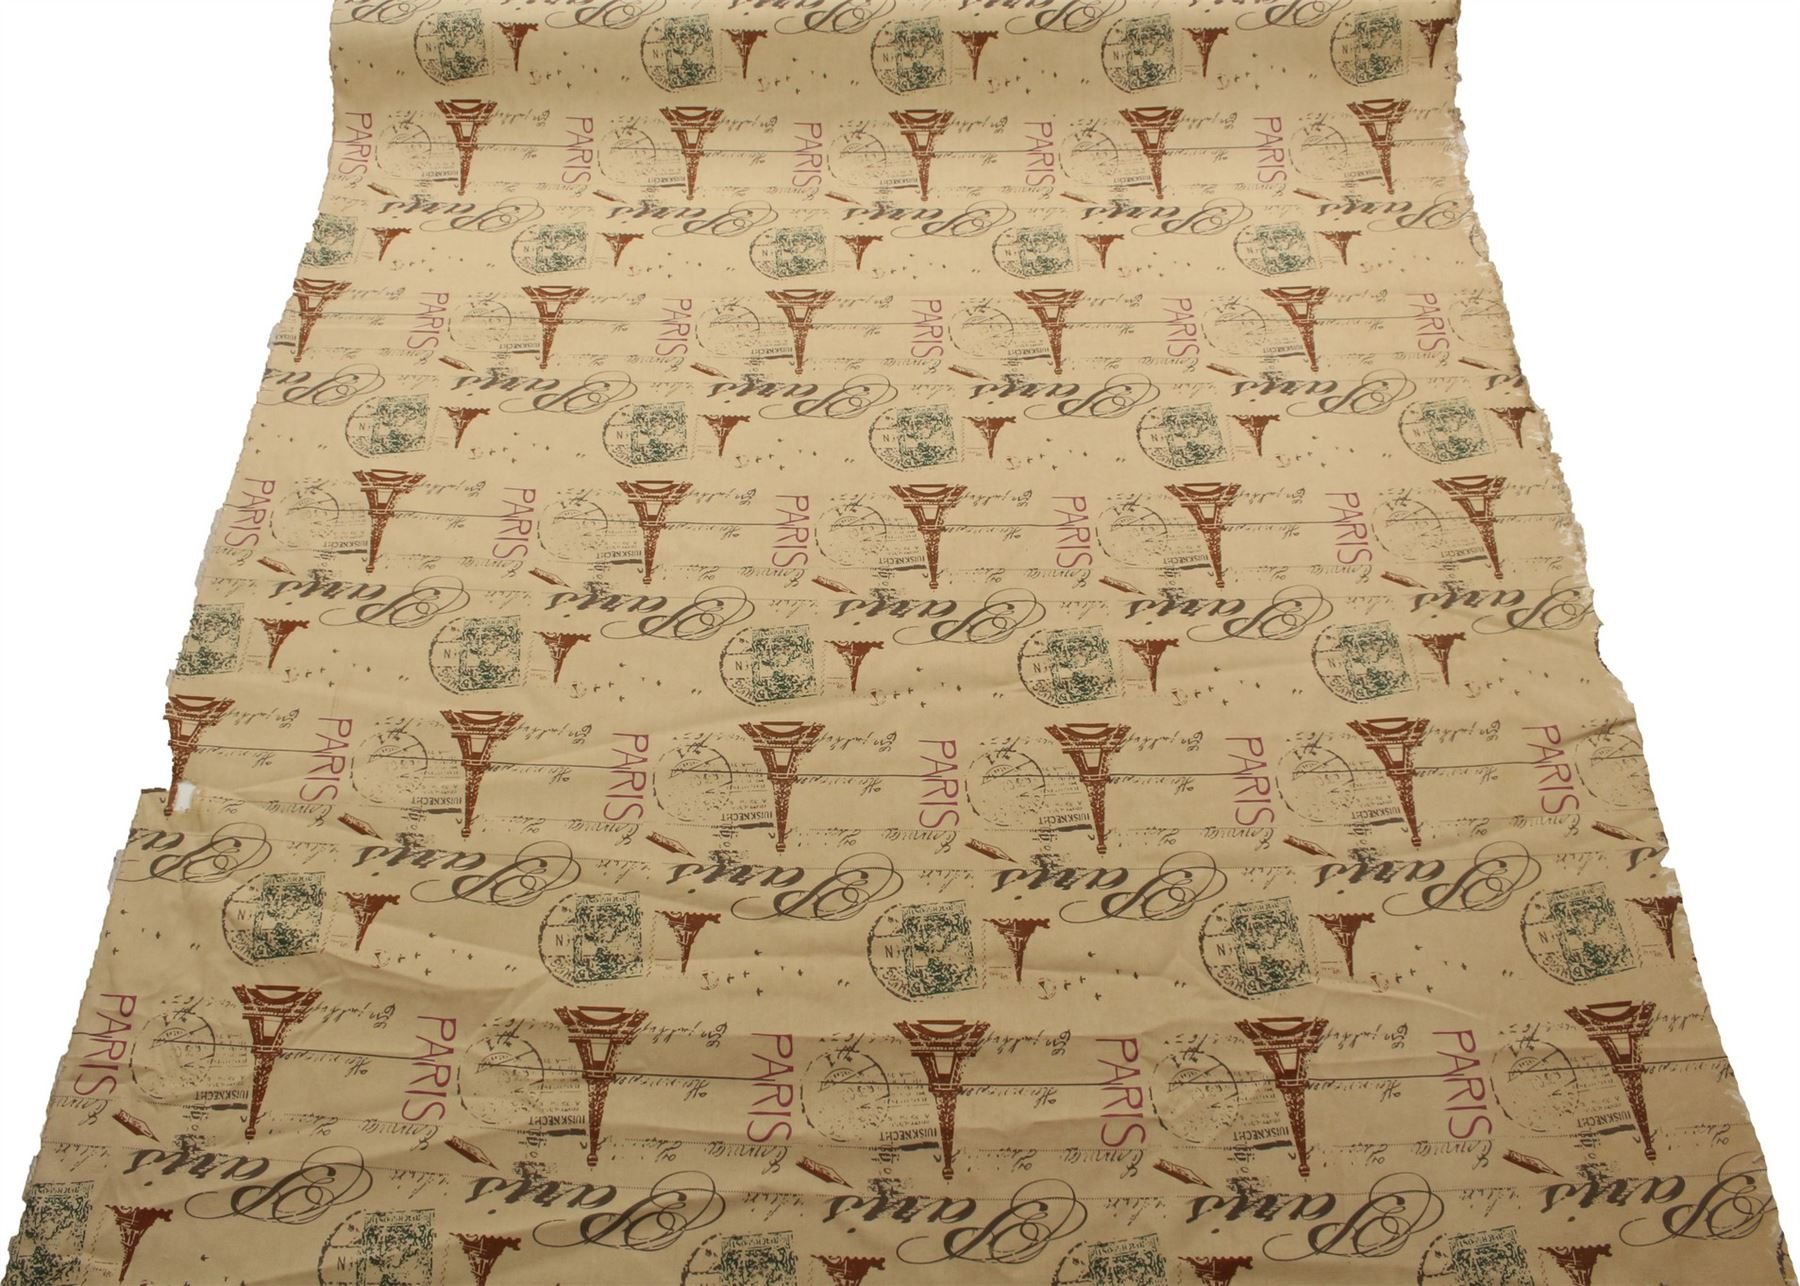 thumbnail 71 - 100% Heavy Cotton Panama Printed Childrens Curtain Cushion Upholstery Fabric